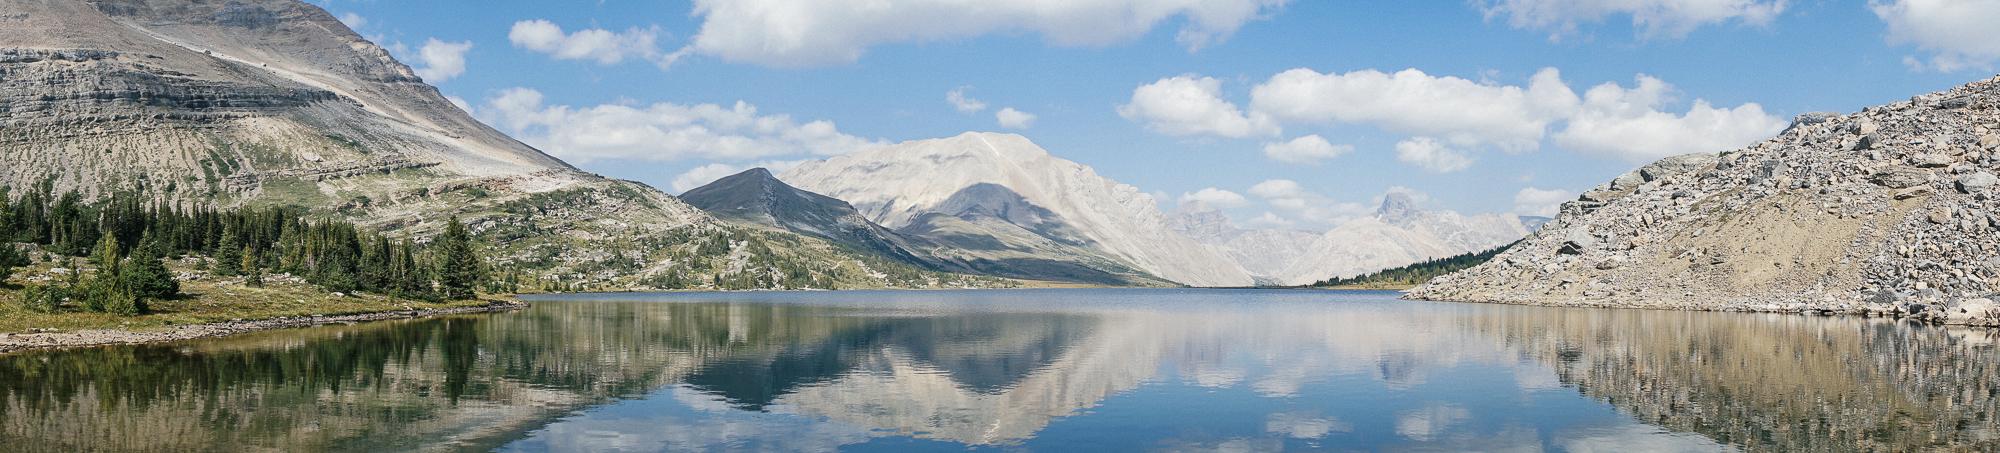 Banff-03467.jpg